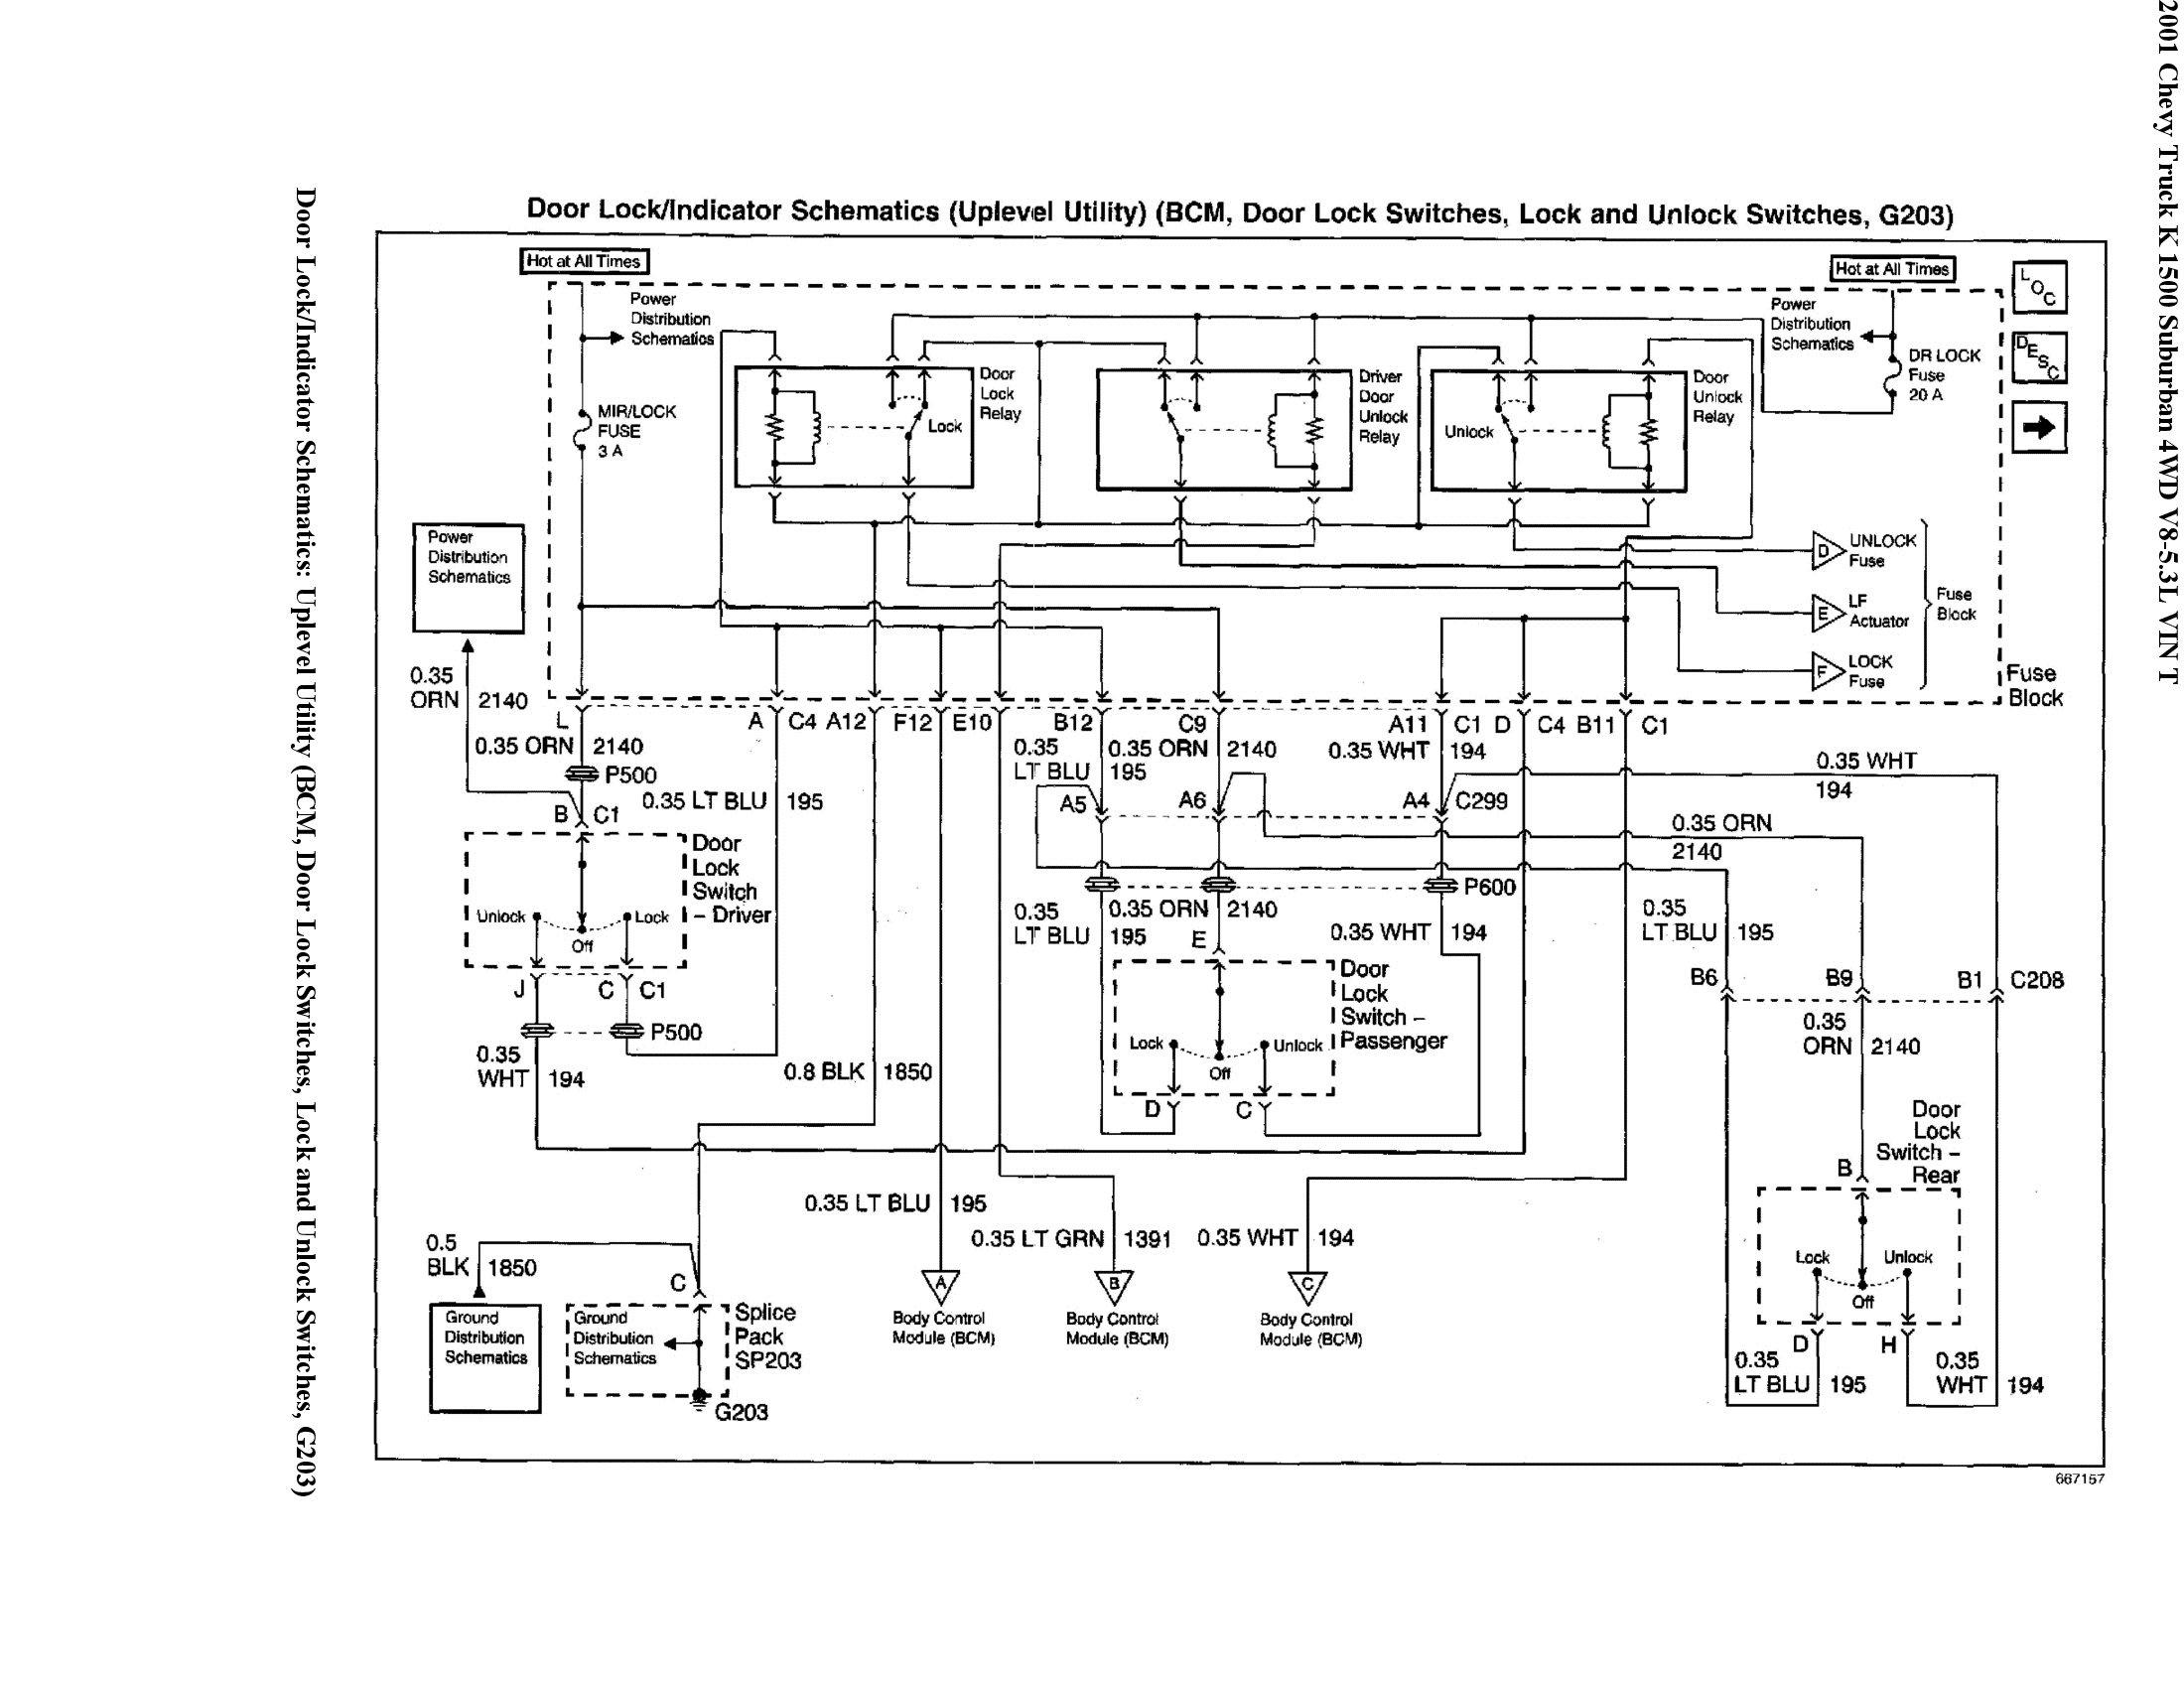 XH_0570] Chevrolet Door Lock Wiring Free DiagramIttab Unec Seme Icaen Mill Omen Tran Kweca Bepta Genion Impa Viewor  Mohammedshrine Librar Wiring 101